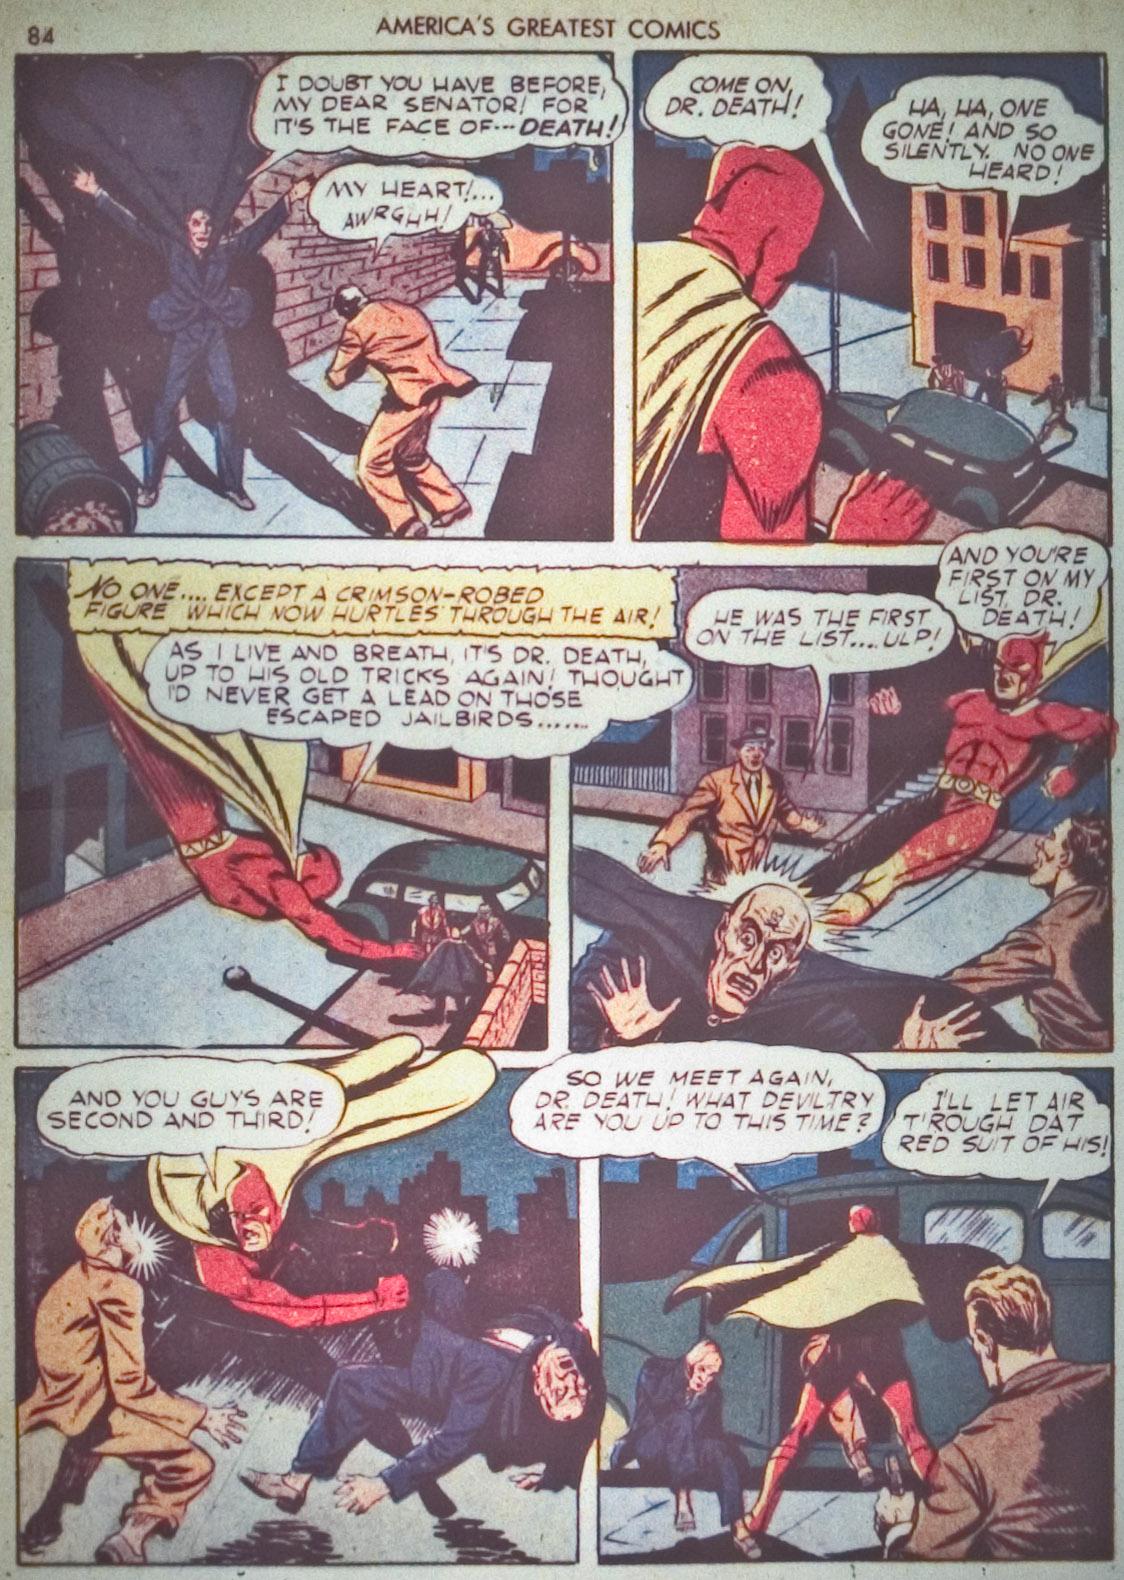 Read online America's Greatest Comics comic -  Issue #1 - 87